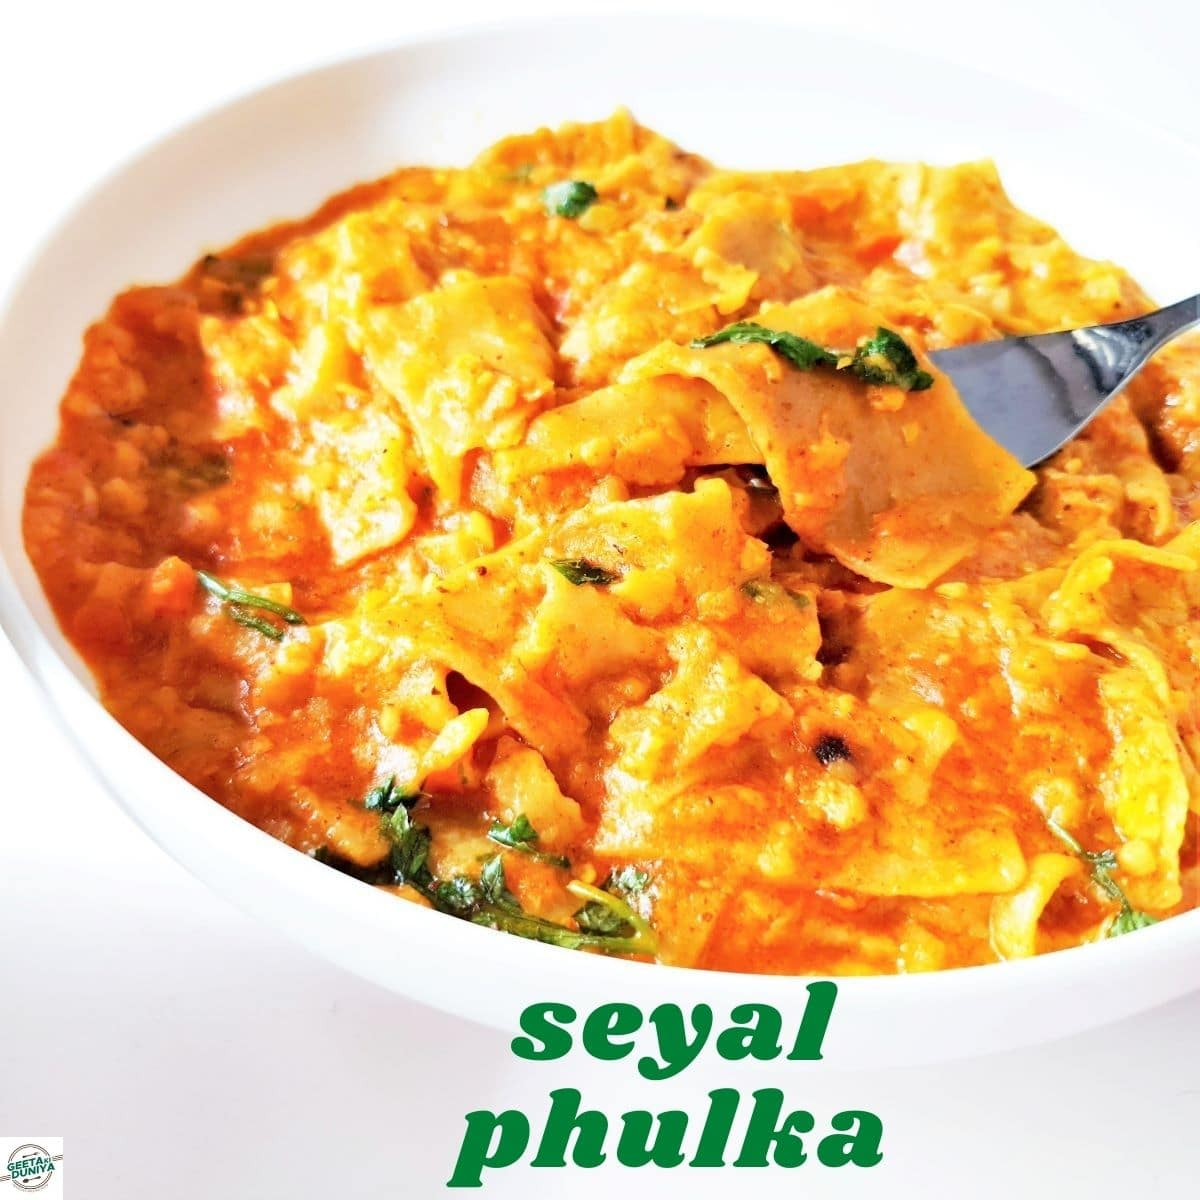 seyal phulka